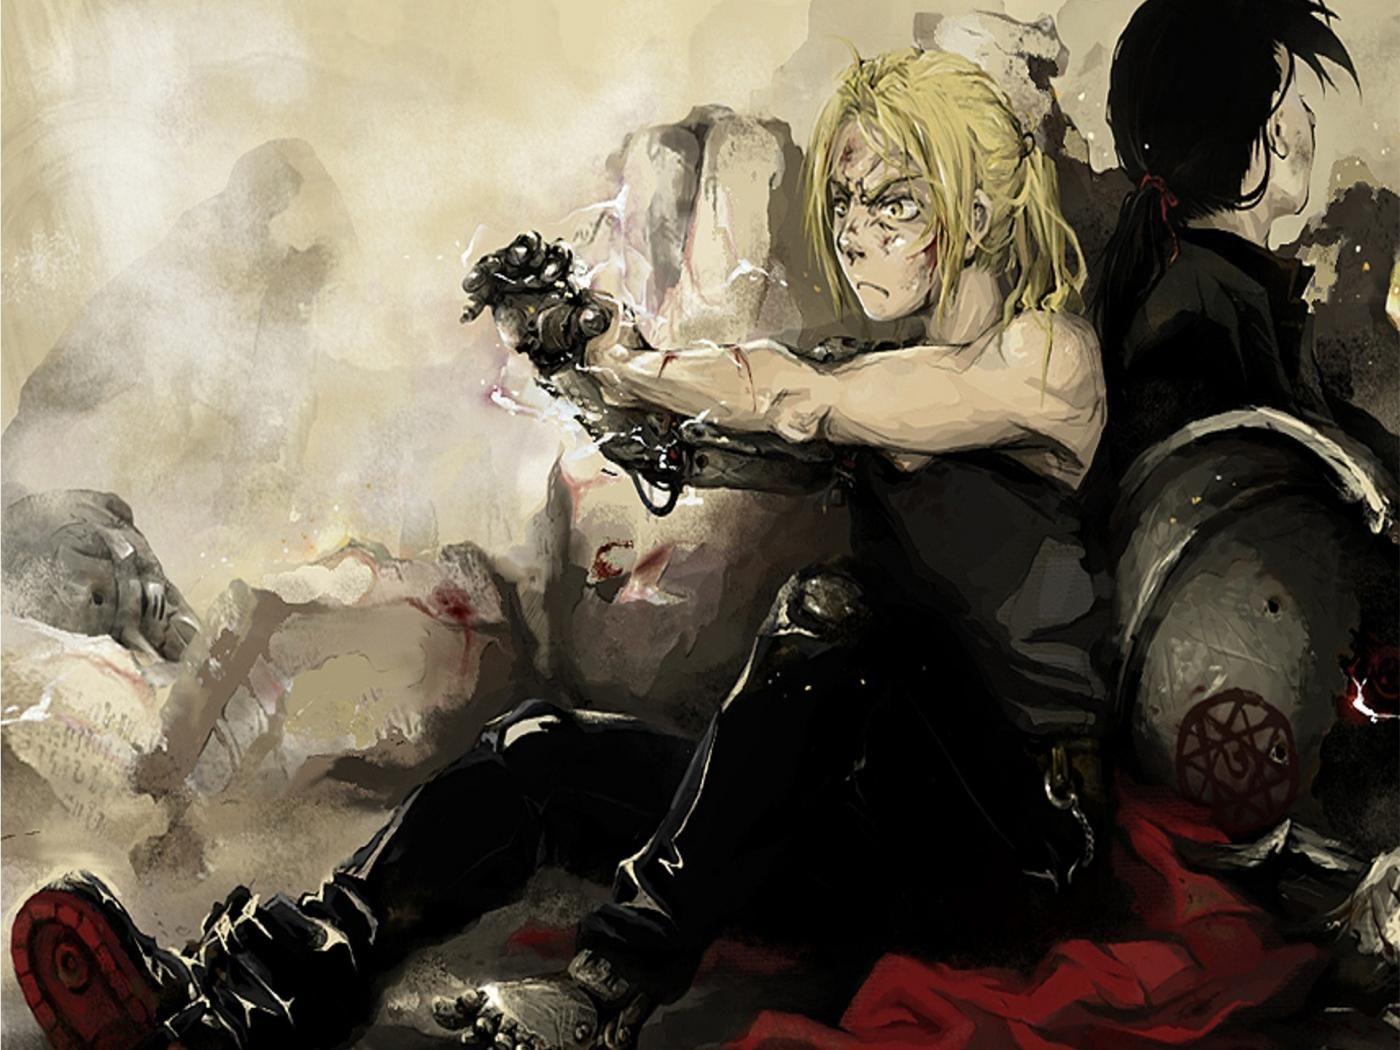 Edward Elric In Hd Wallpaper Anime Full Metal Alchemist